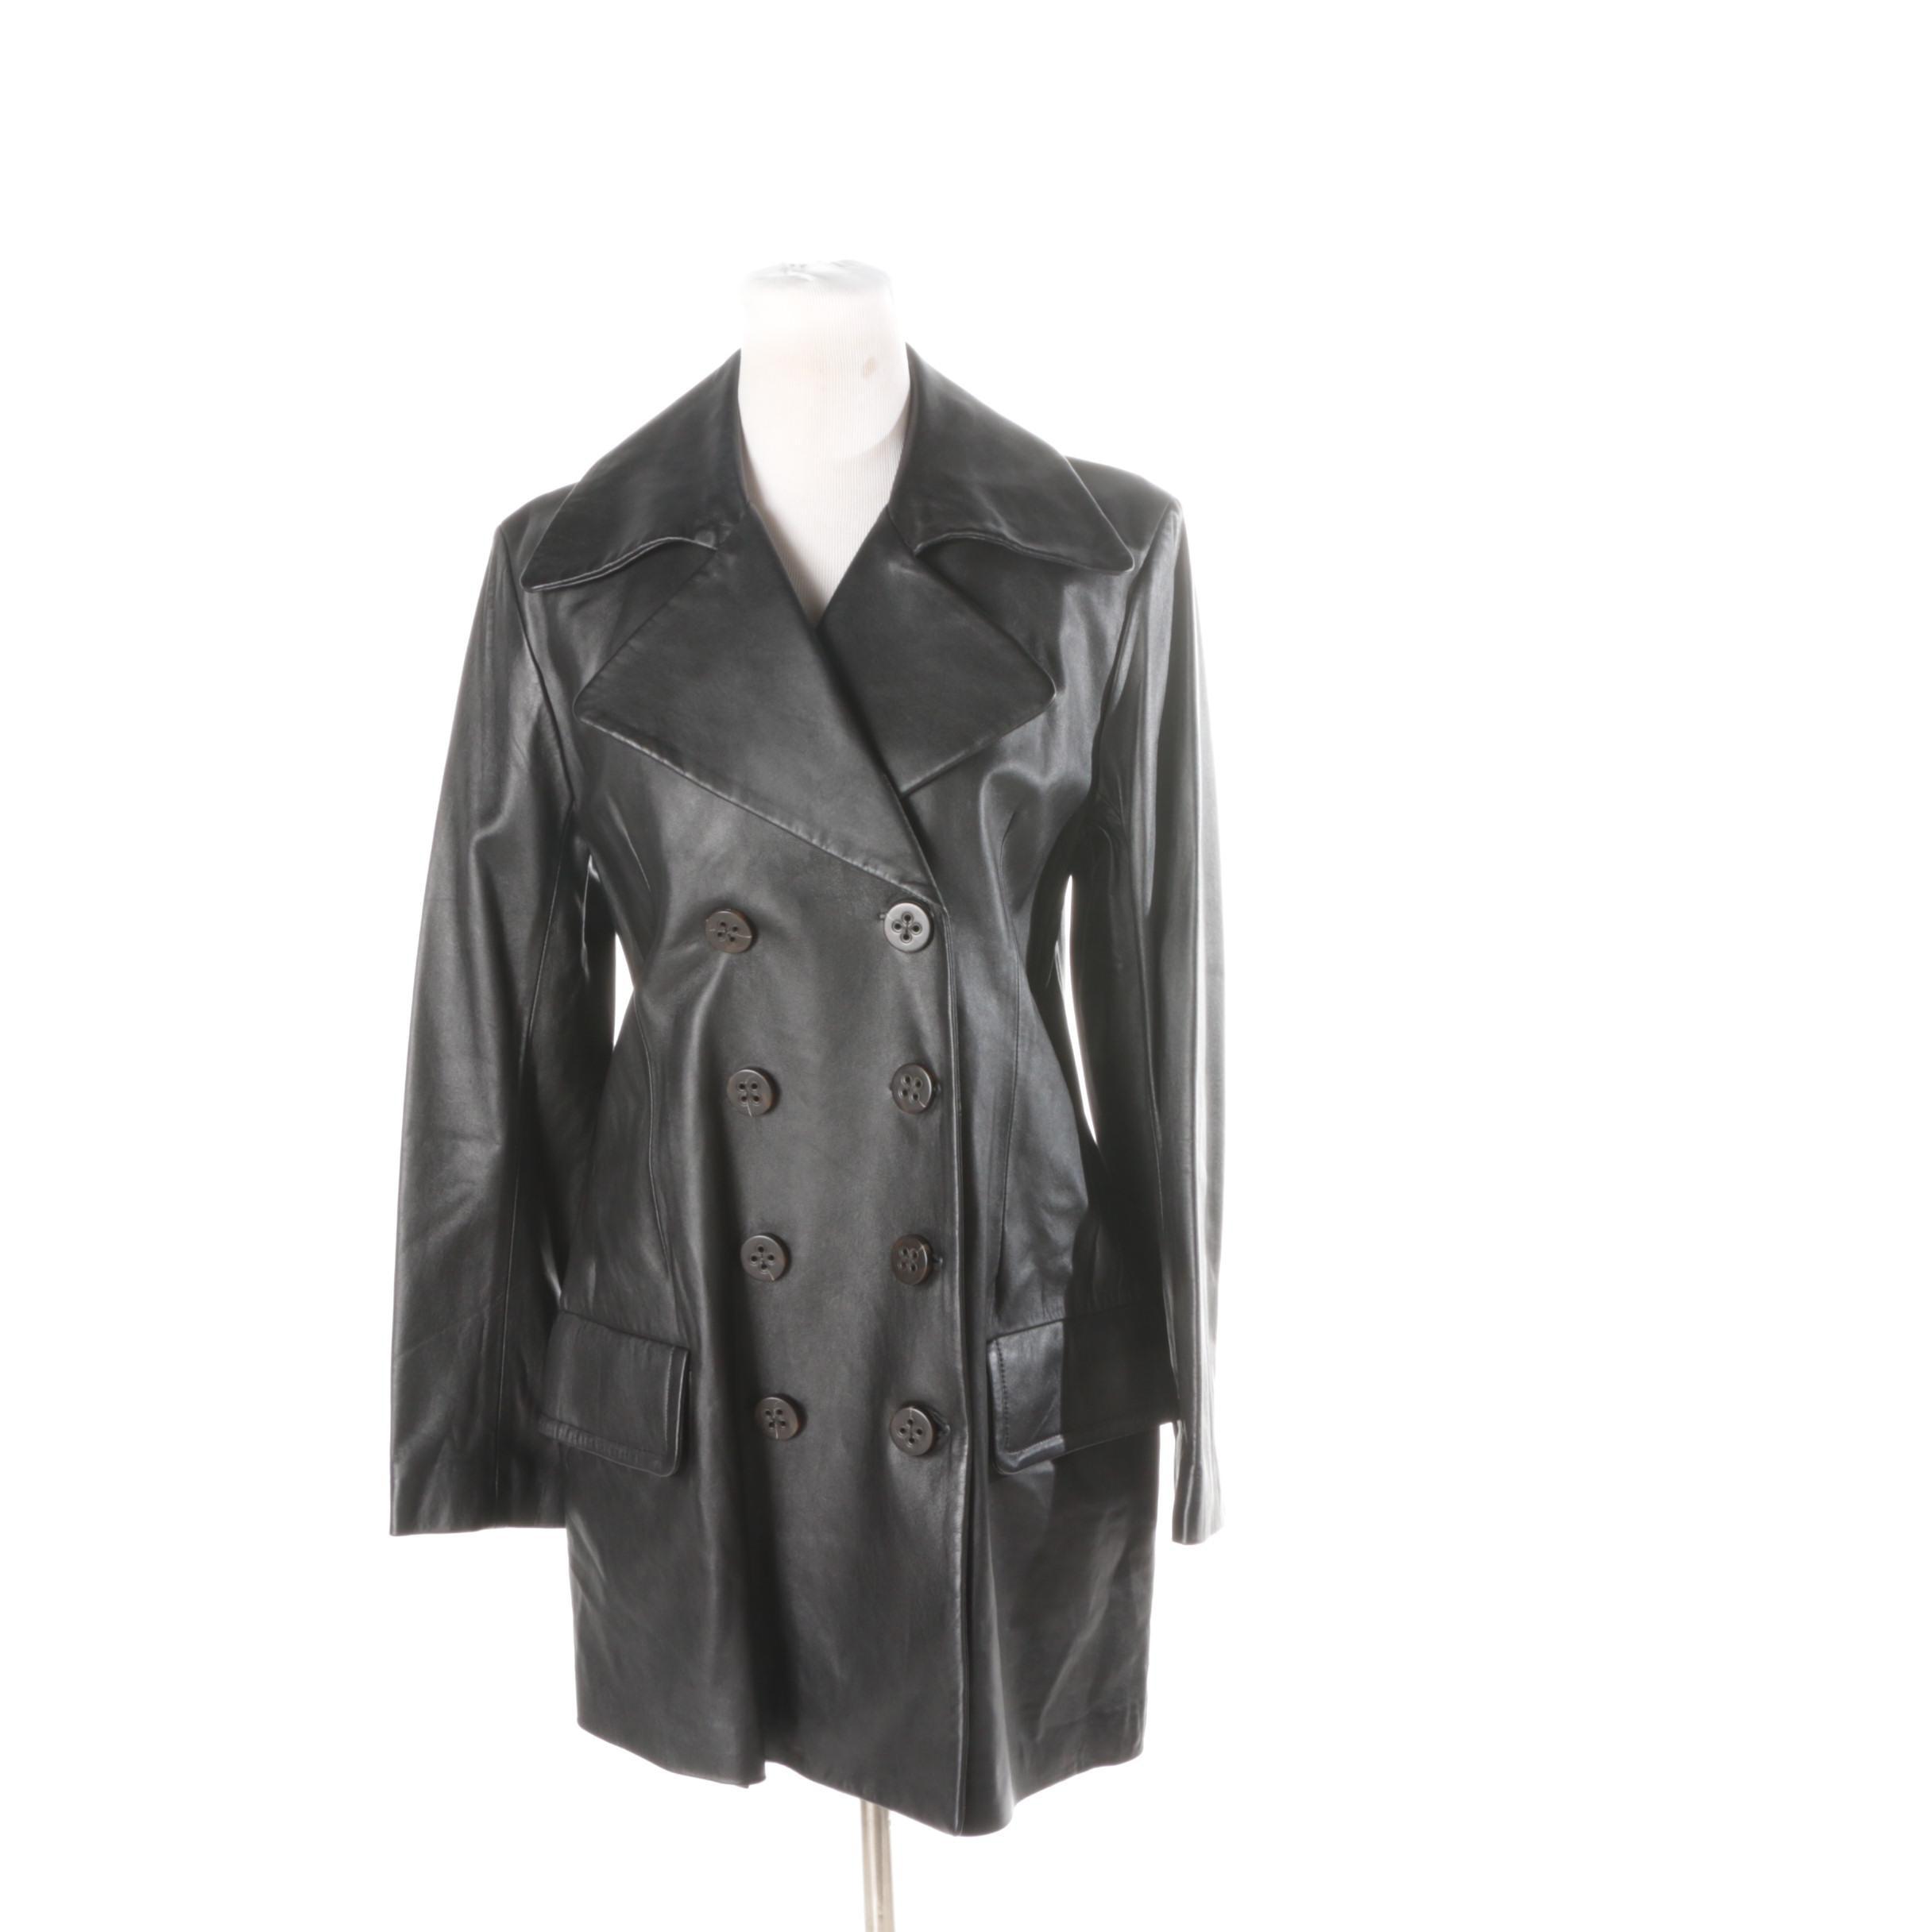 Women's EB International Leather Jacket